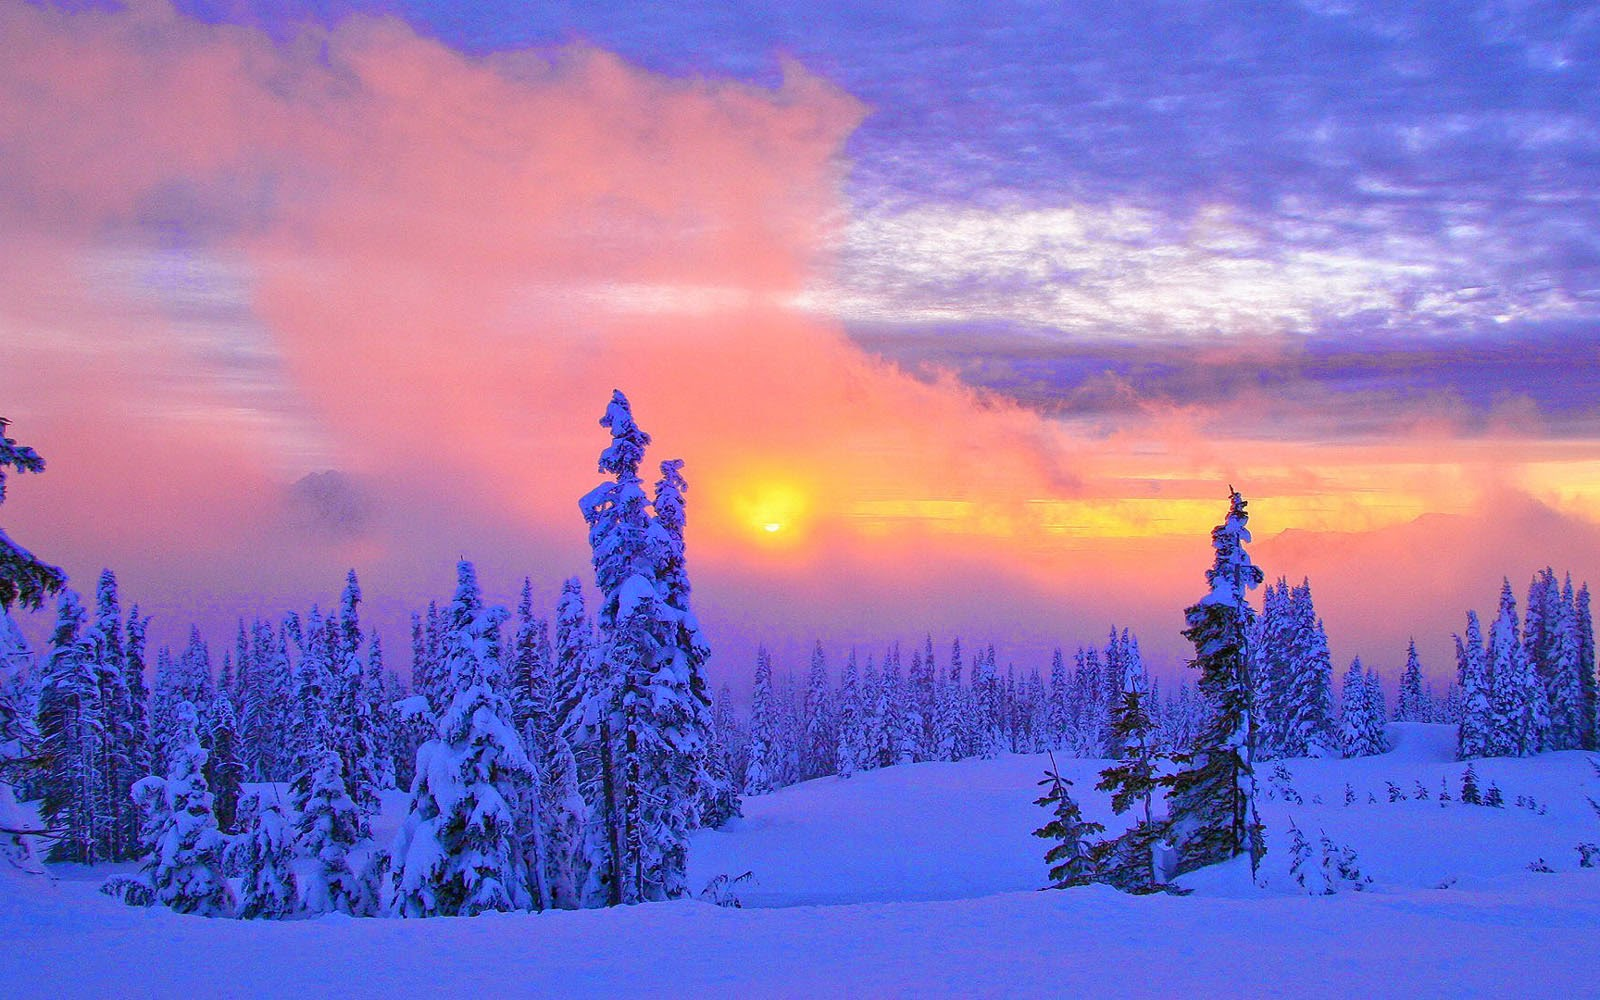 Wallpapers beautiful winter scenery wallpapers - Winter desktop ...